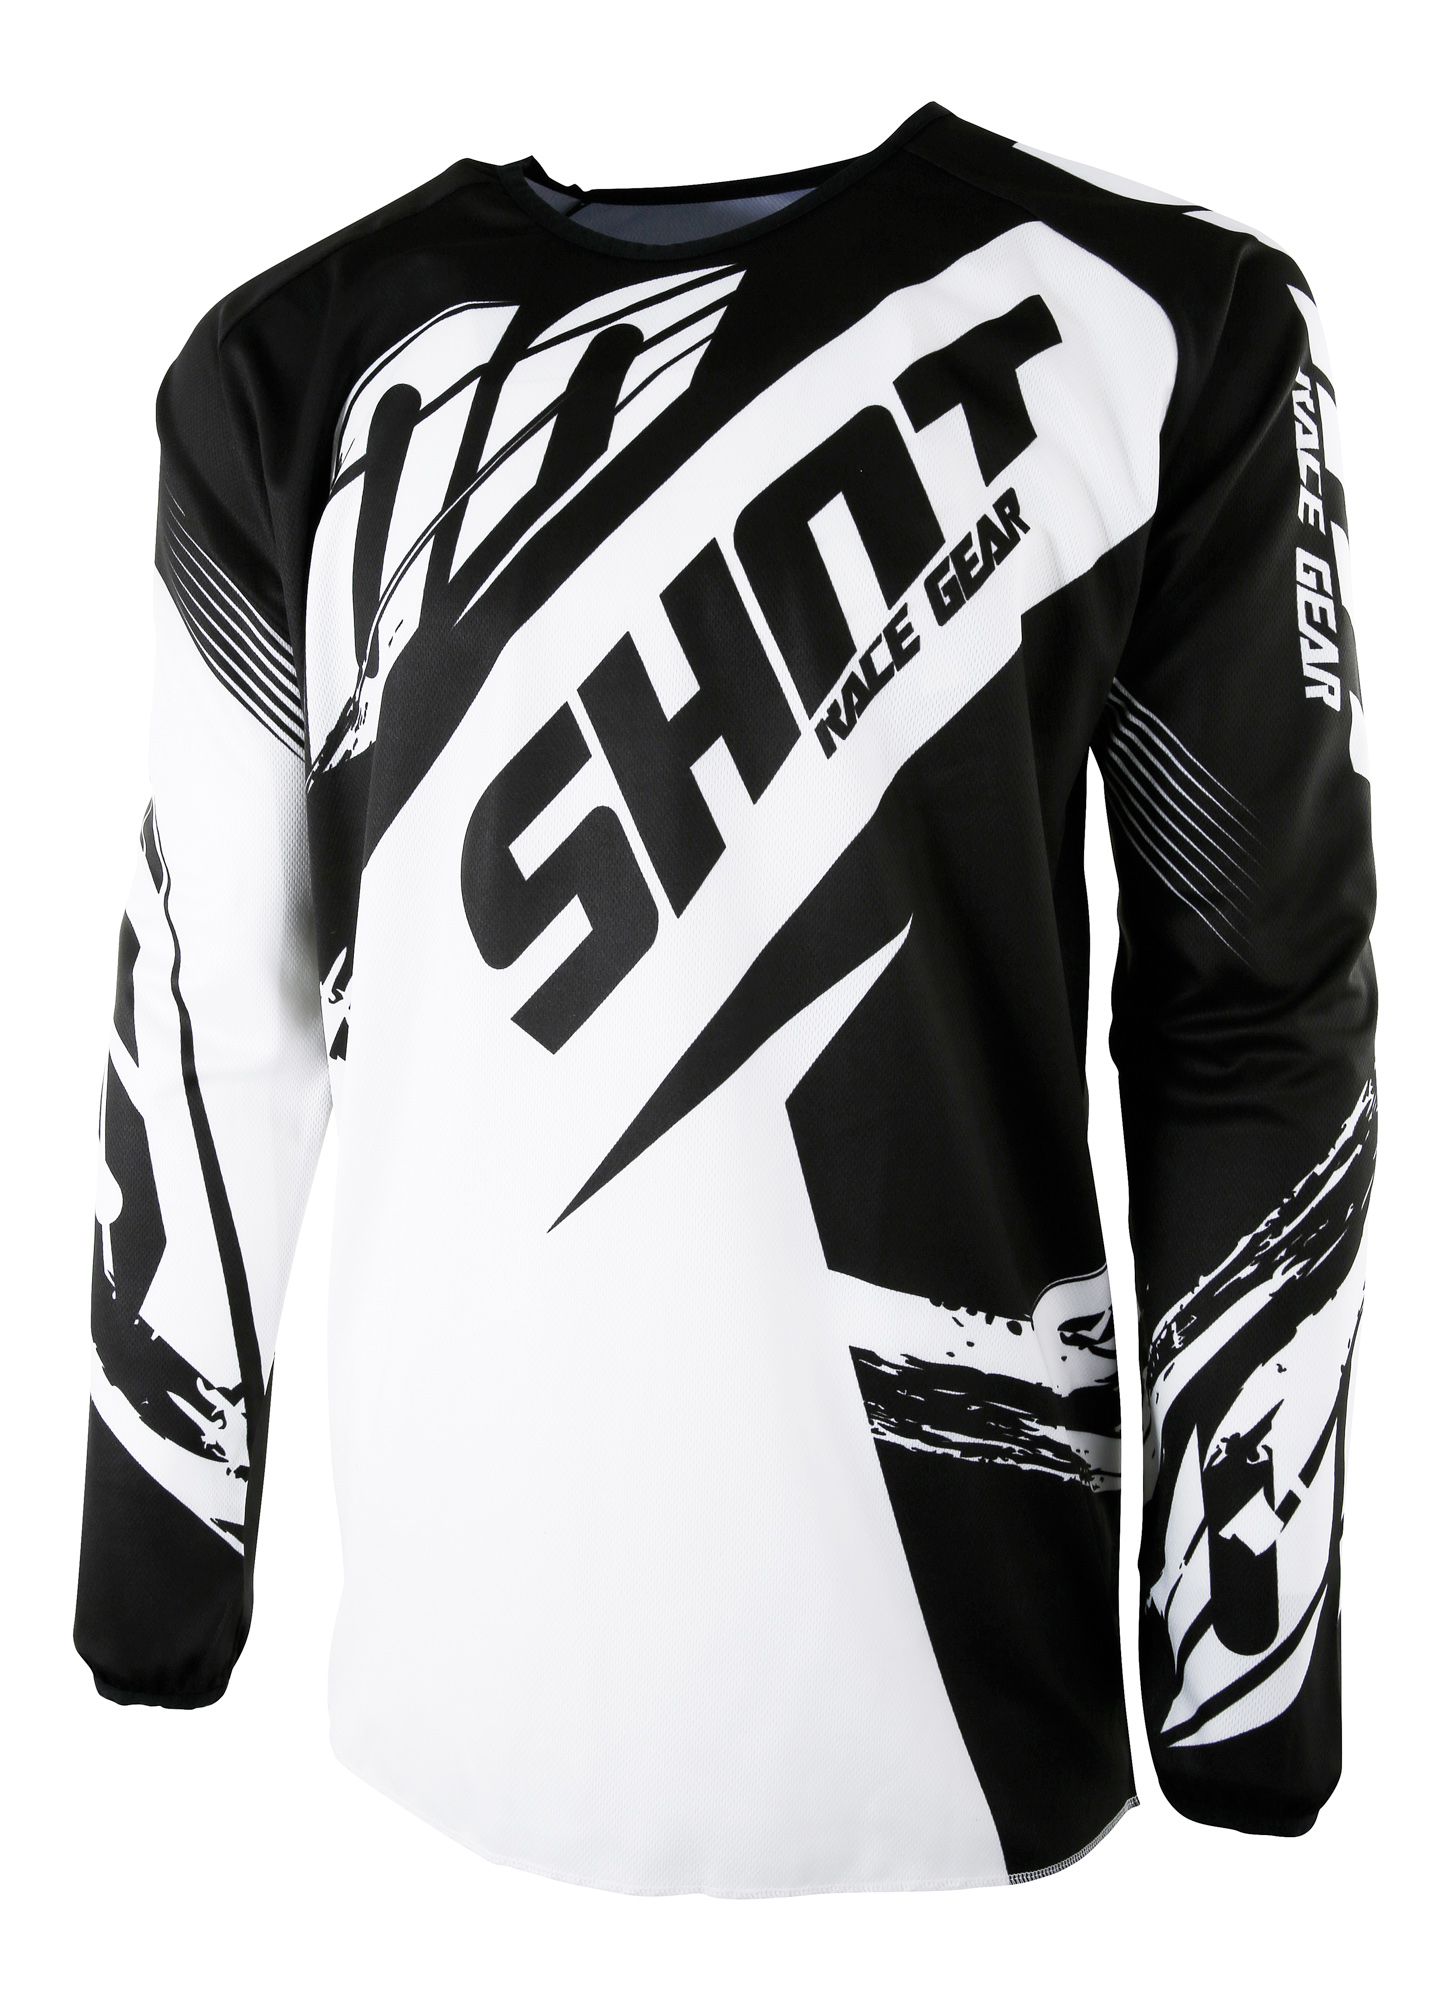 Shot Devo Ultimate Kids Motocross Jersey Lightweight Motorcross MX Youth Top New